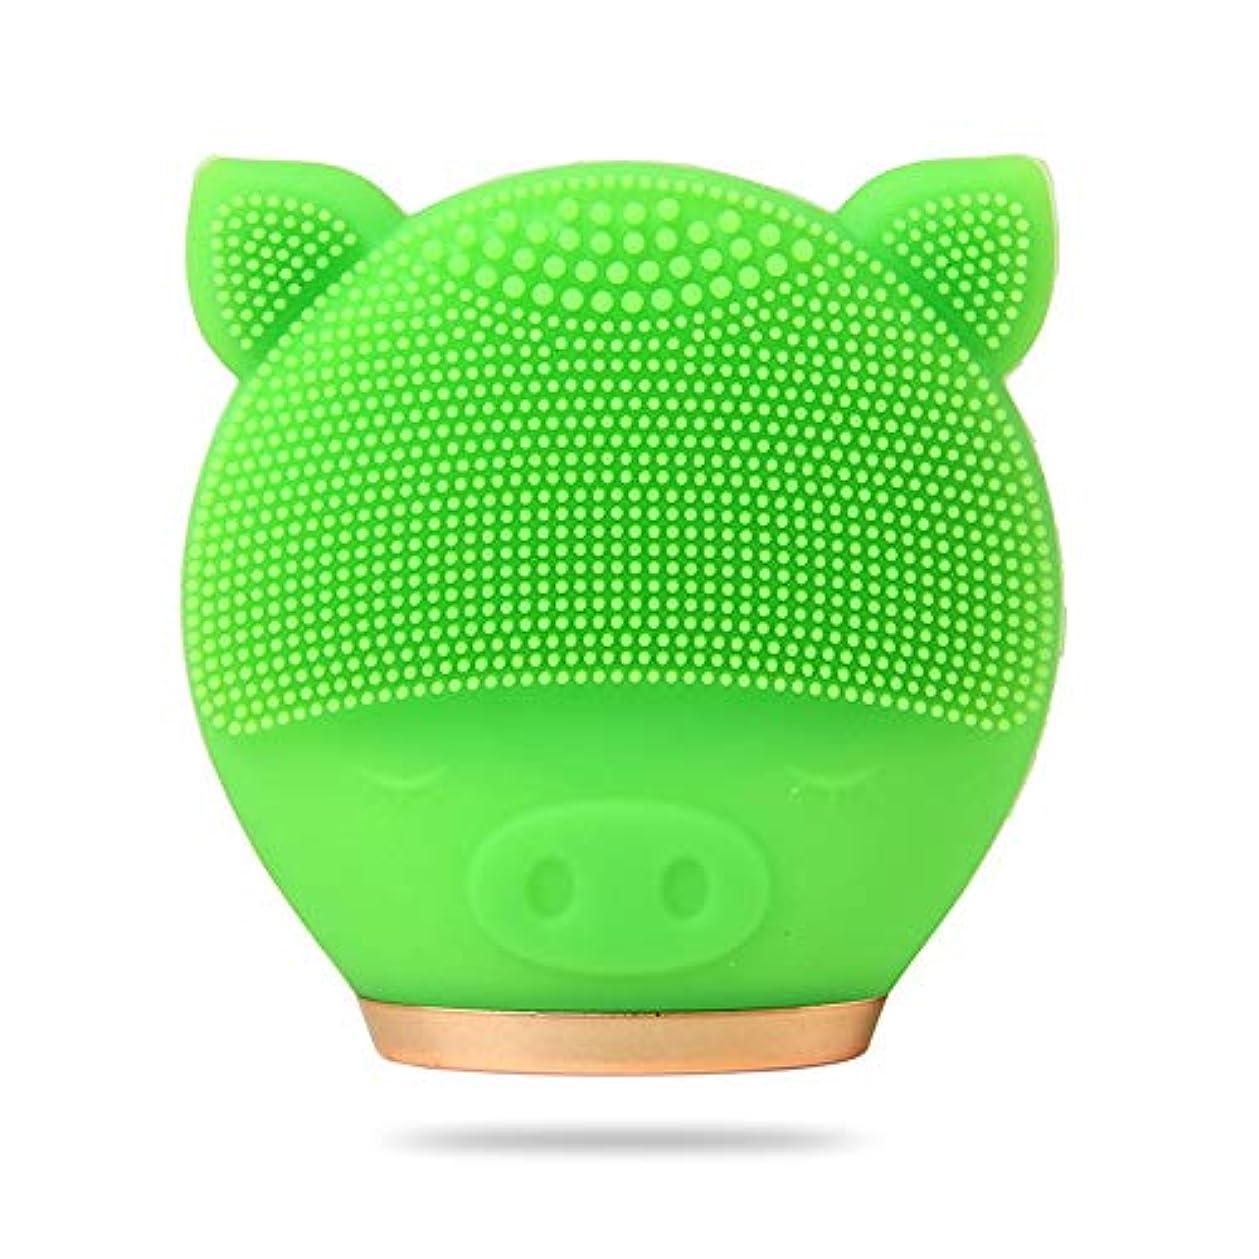 ZXF 新しい豚モデル電気クレンジング楽器シリコーン超音波振動洗浄顔顔毛穴クリーナー美容器具 滑らかである (色 : Green)